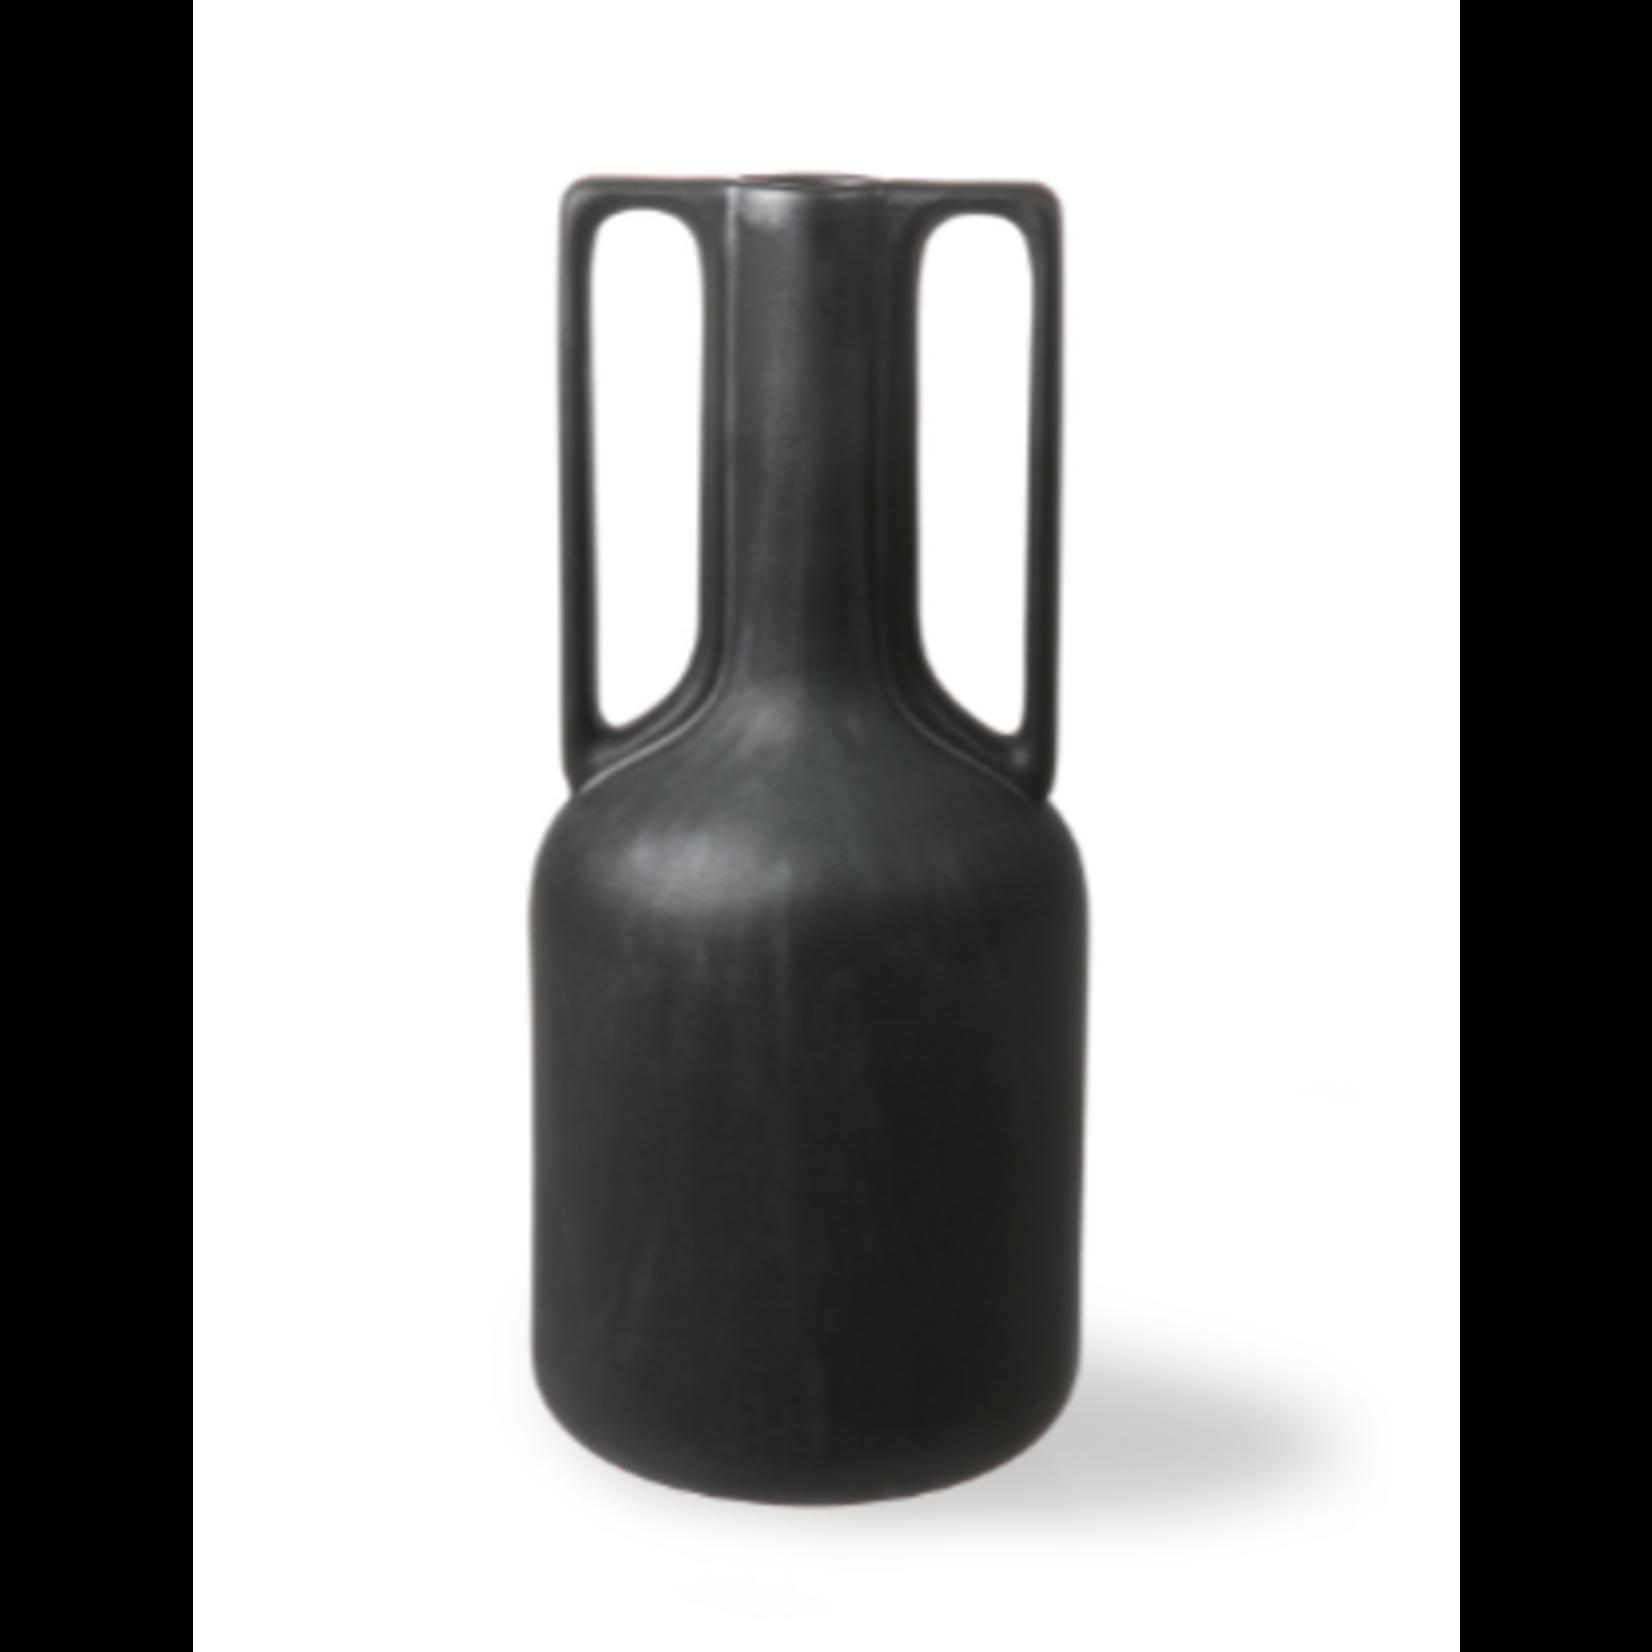 HK Living HK Living Ceramic Vase black with handles